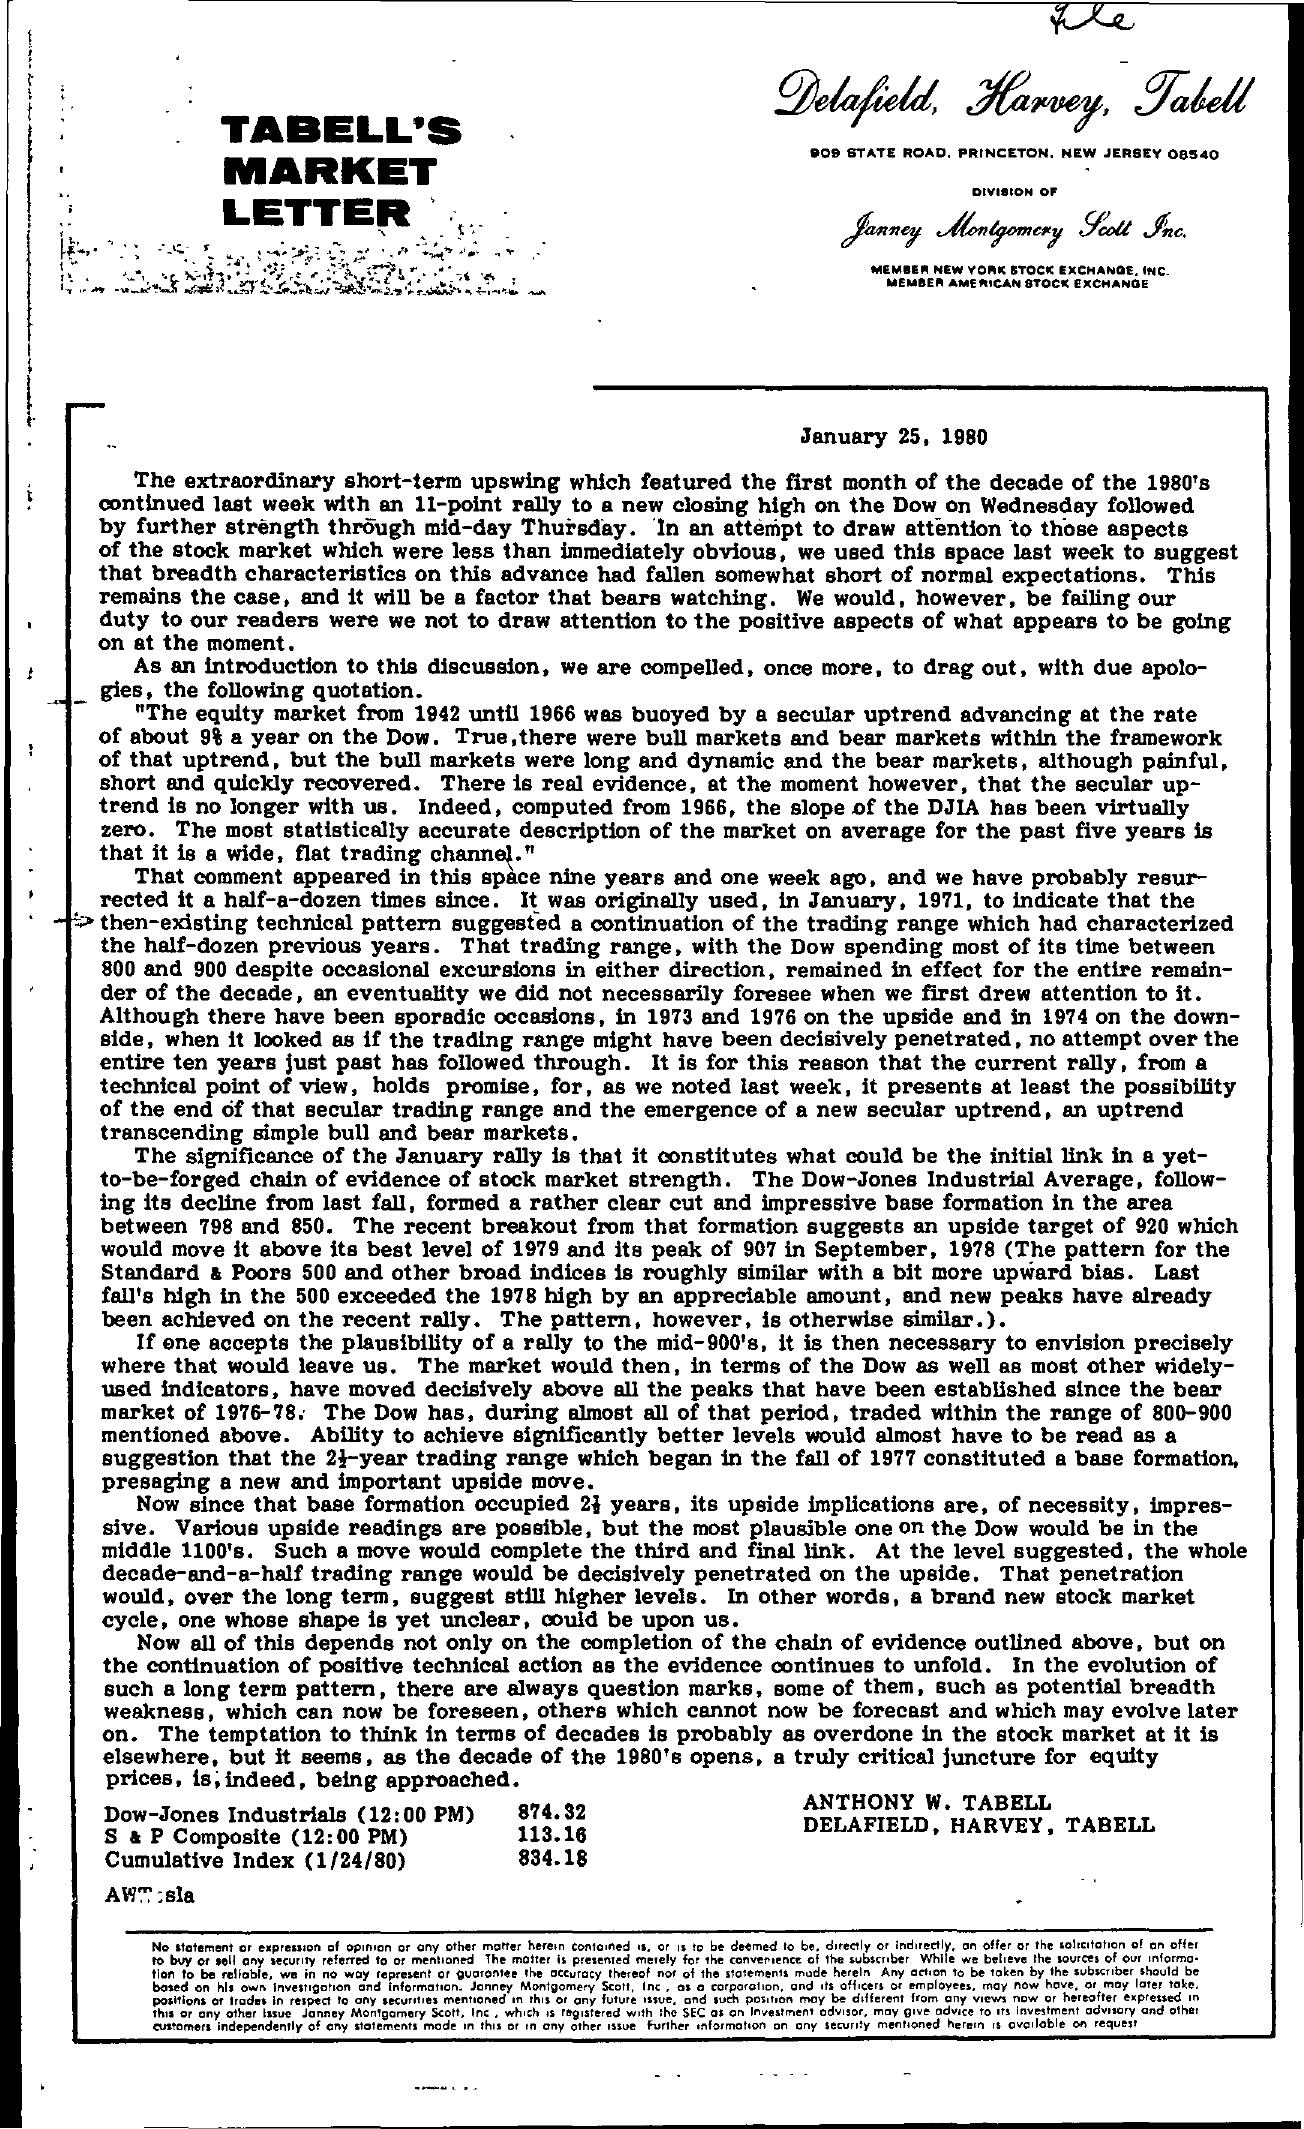 Tabell's Market Letter - January 25, 1980